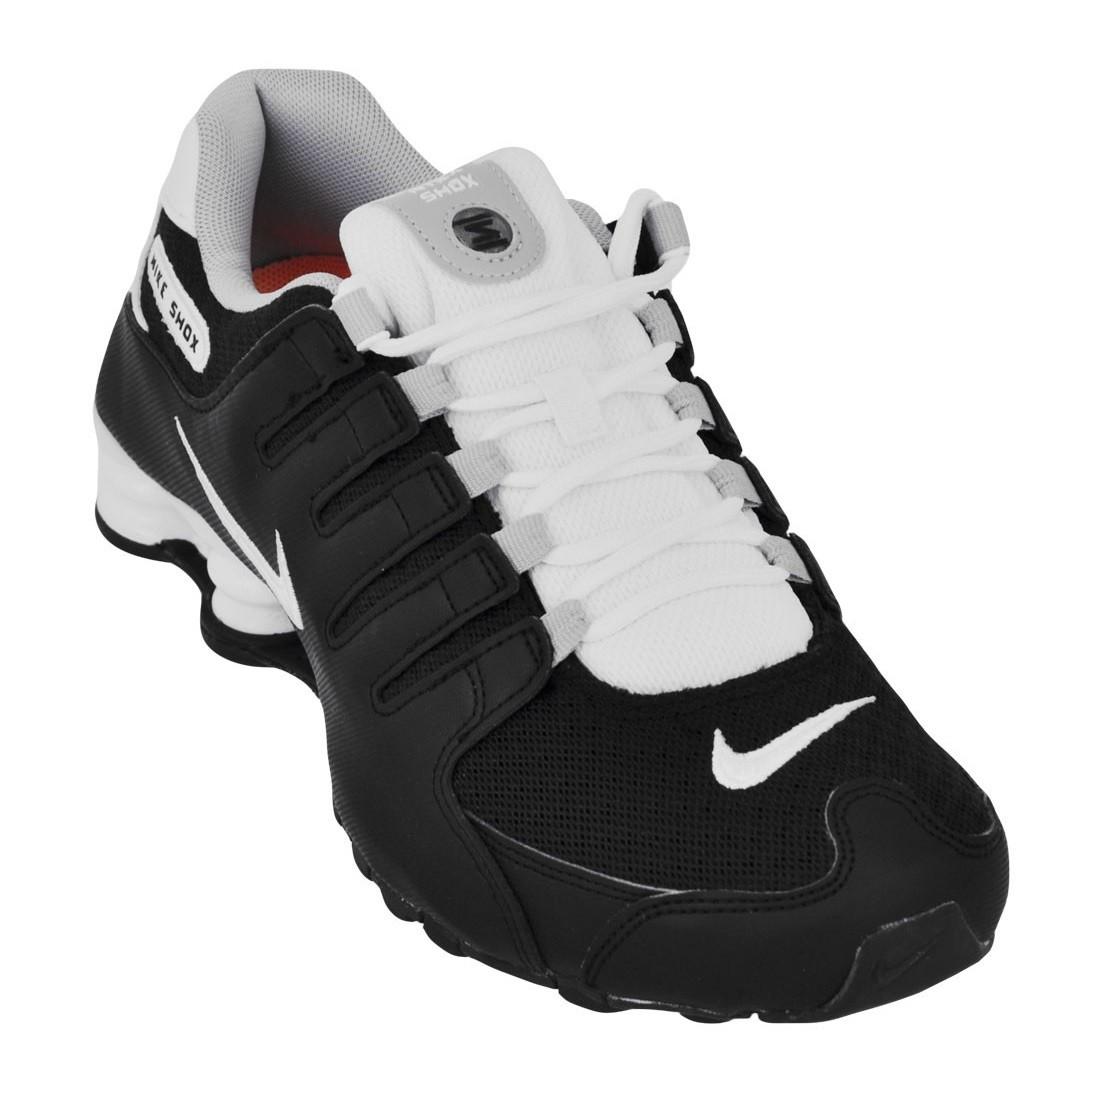 7ddf66d8f3f Tênis Nike Shox NZ SE Masculino 833579-002 - Preto Branco - Botas ...